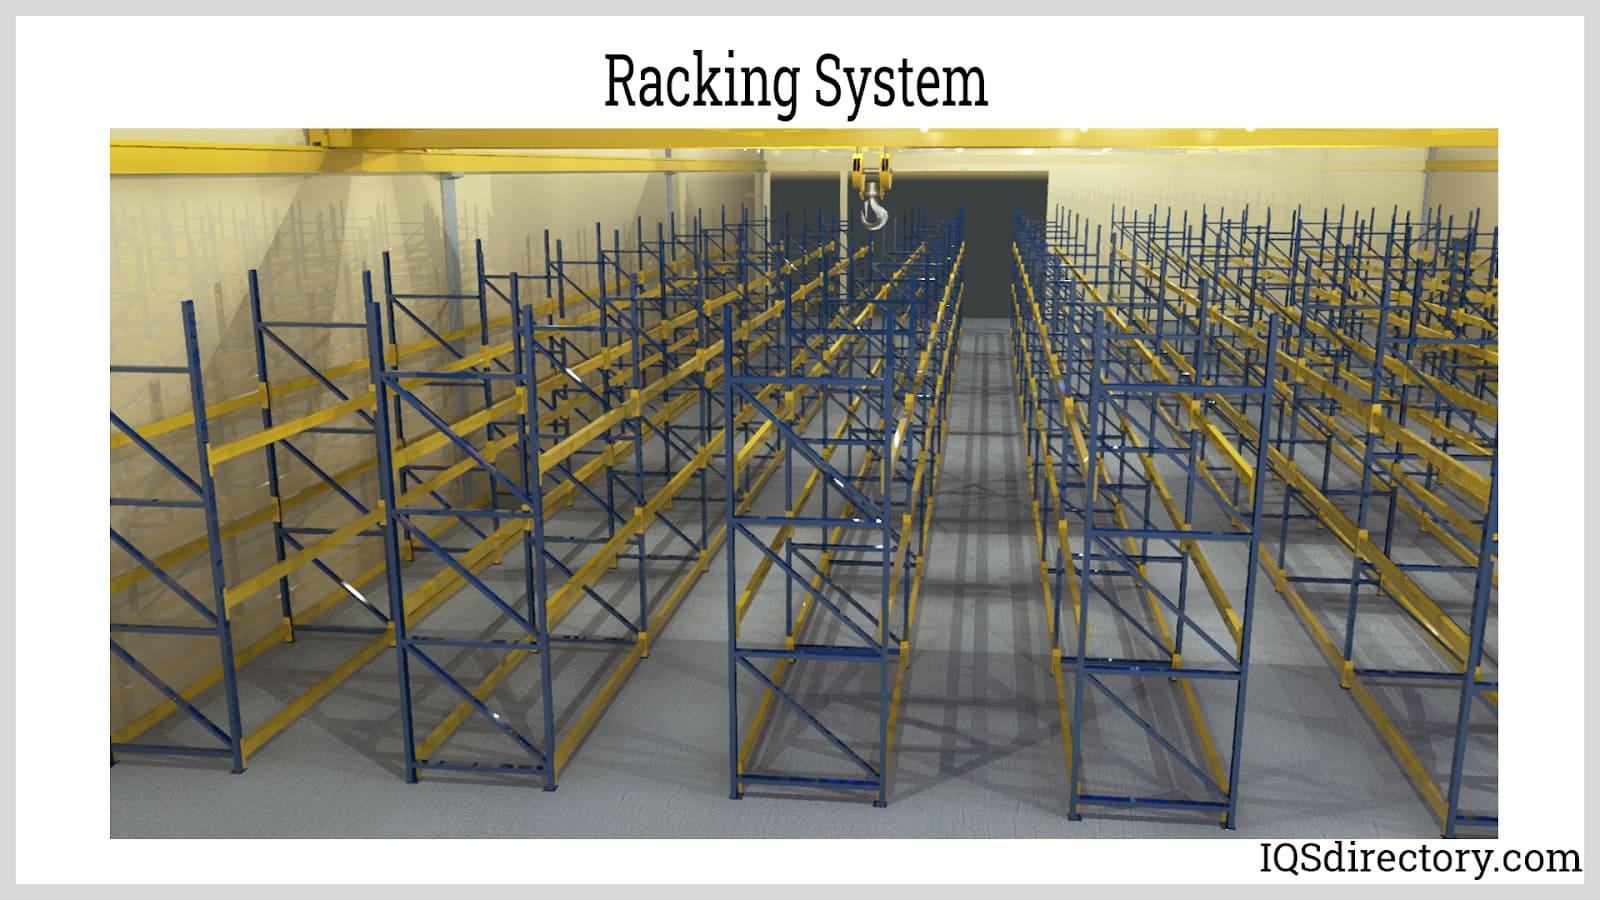 Racking System